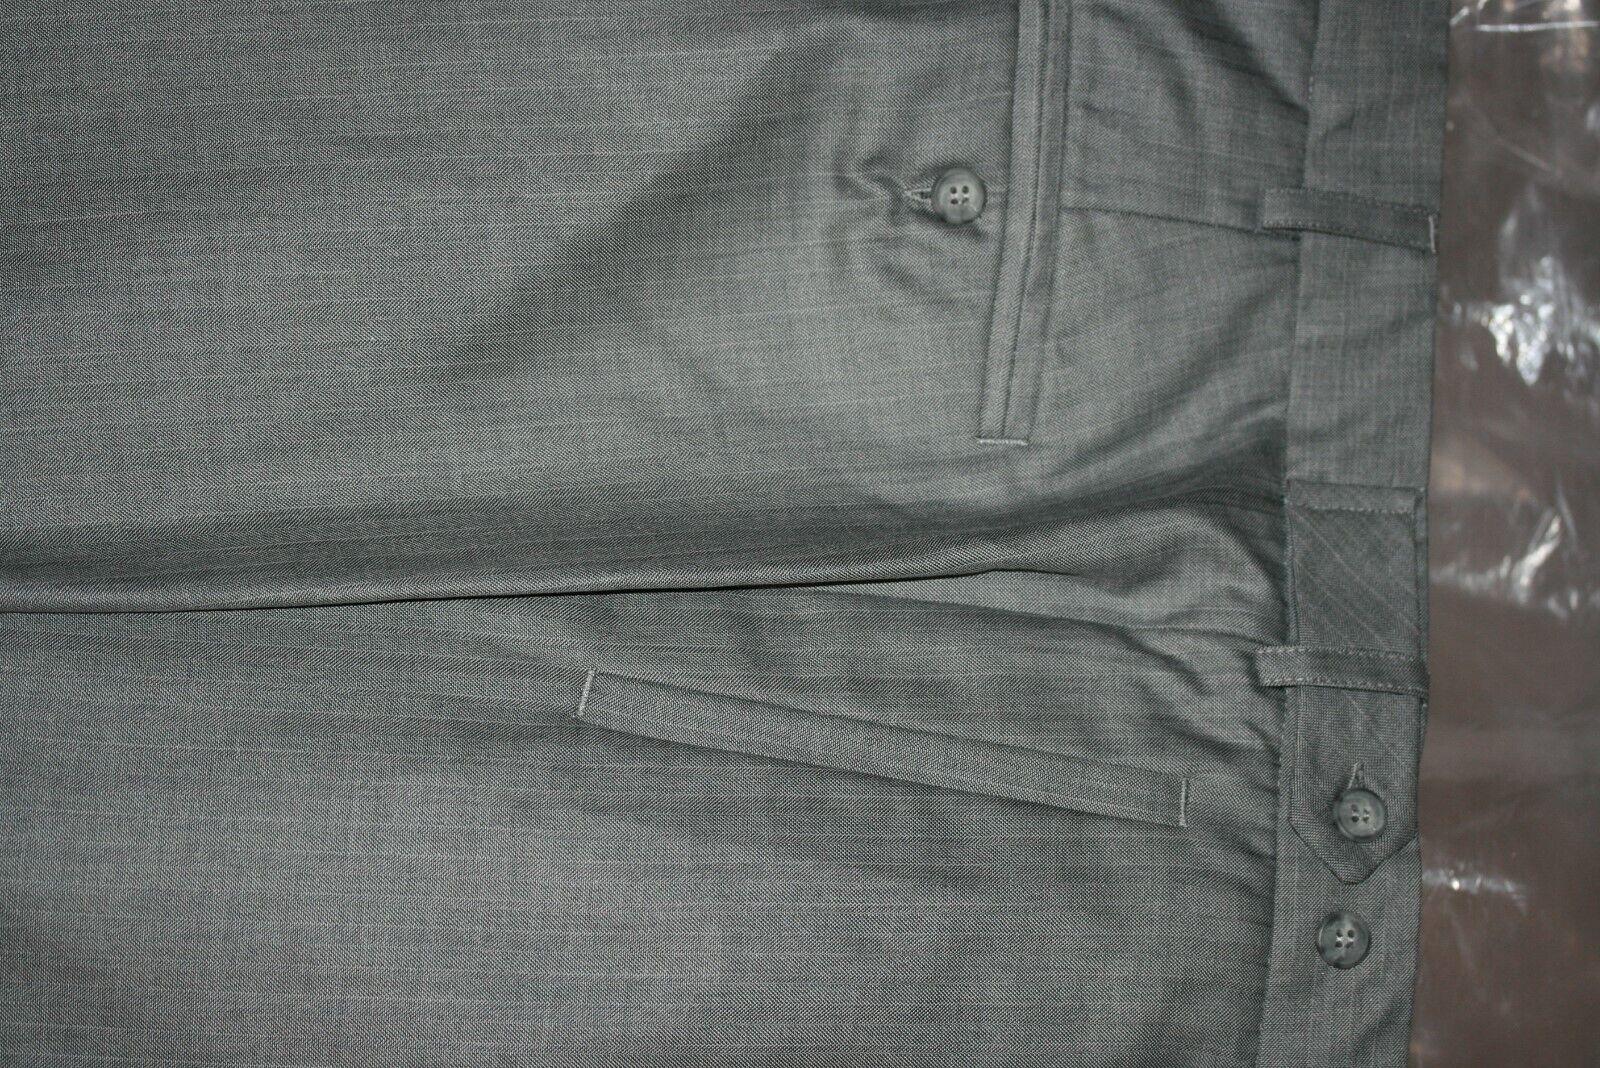 Leichte graue Anzugshose Cut Hose Herrenhose